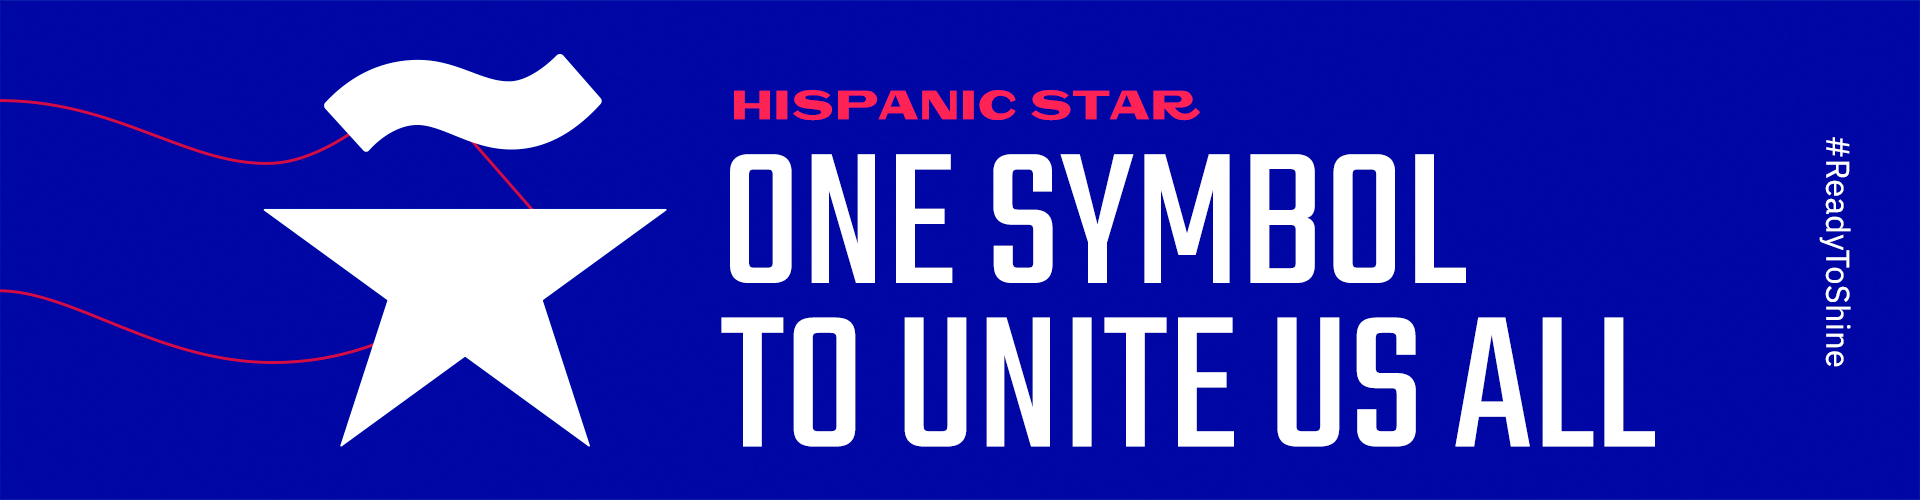 Hispanic Star banner